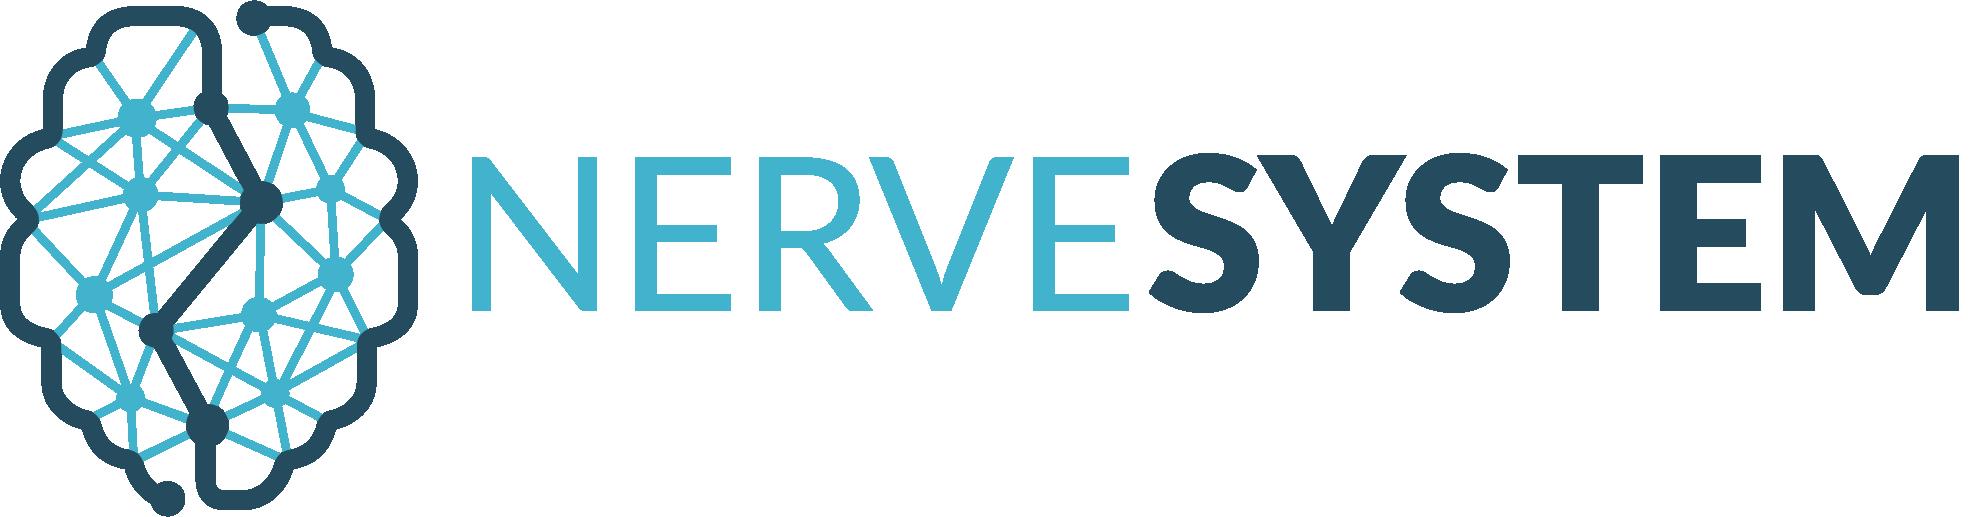 Nervesystem Ltd